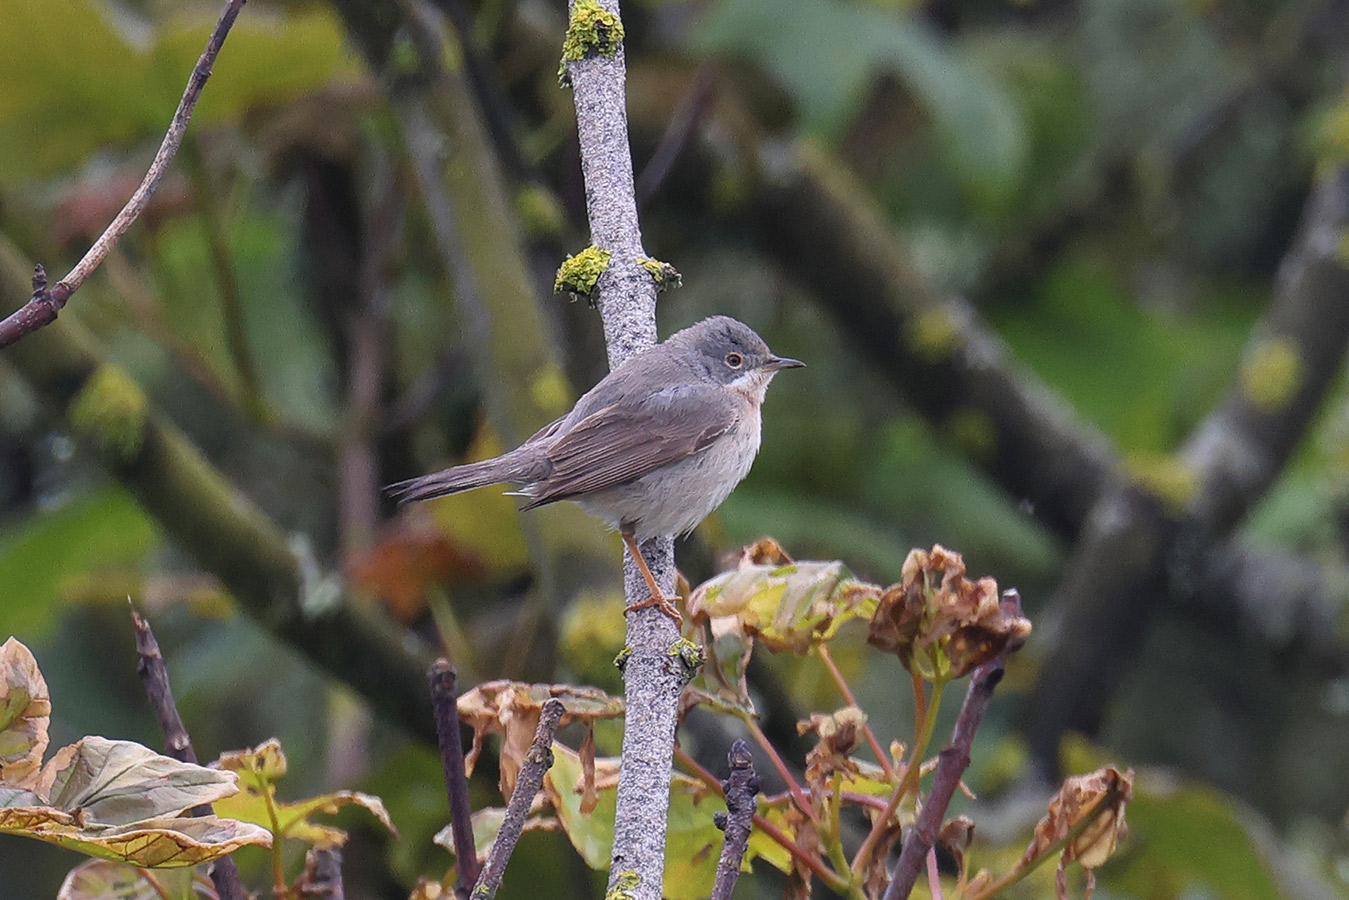 Western Subalpine Warbler, Co. Wexford, Ireland.